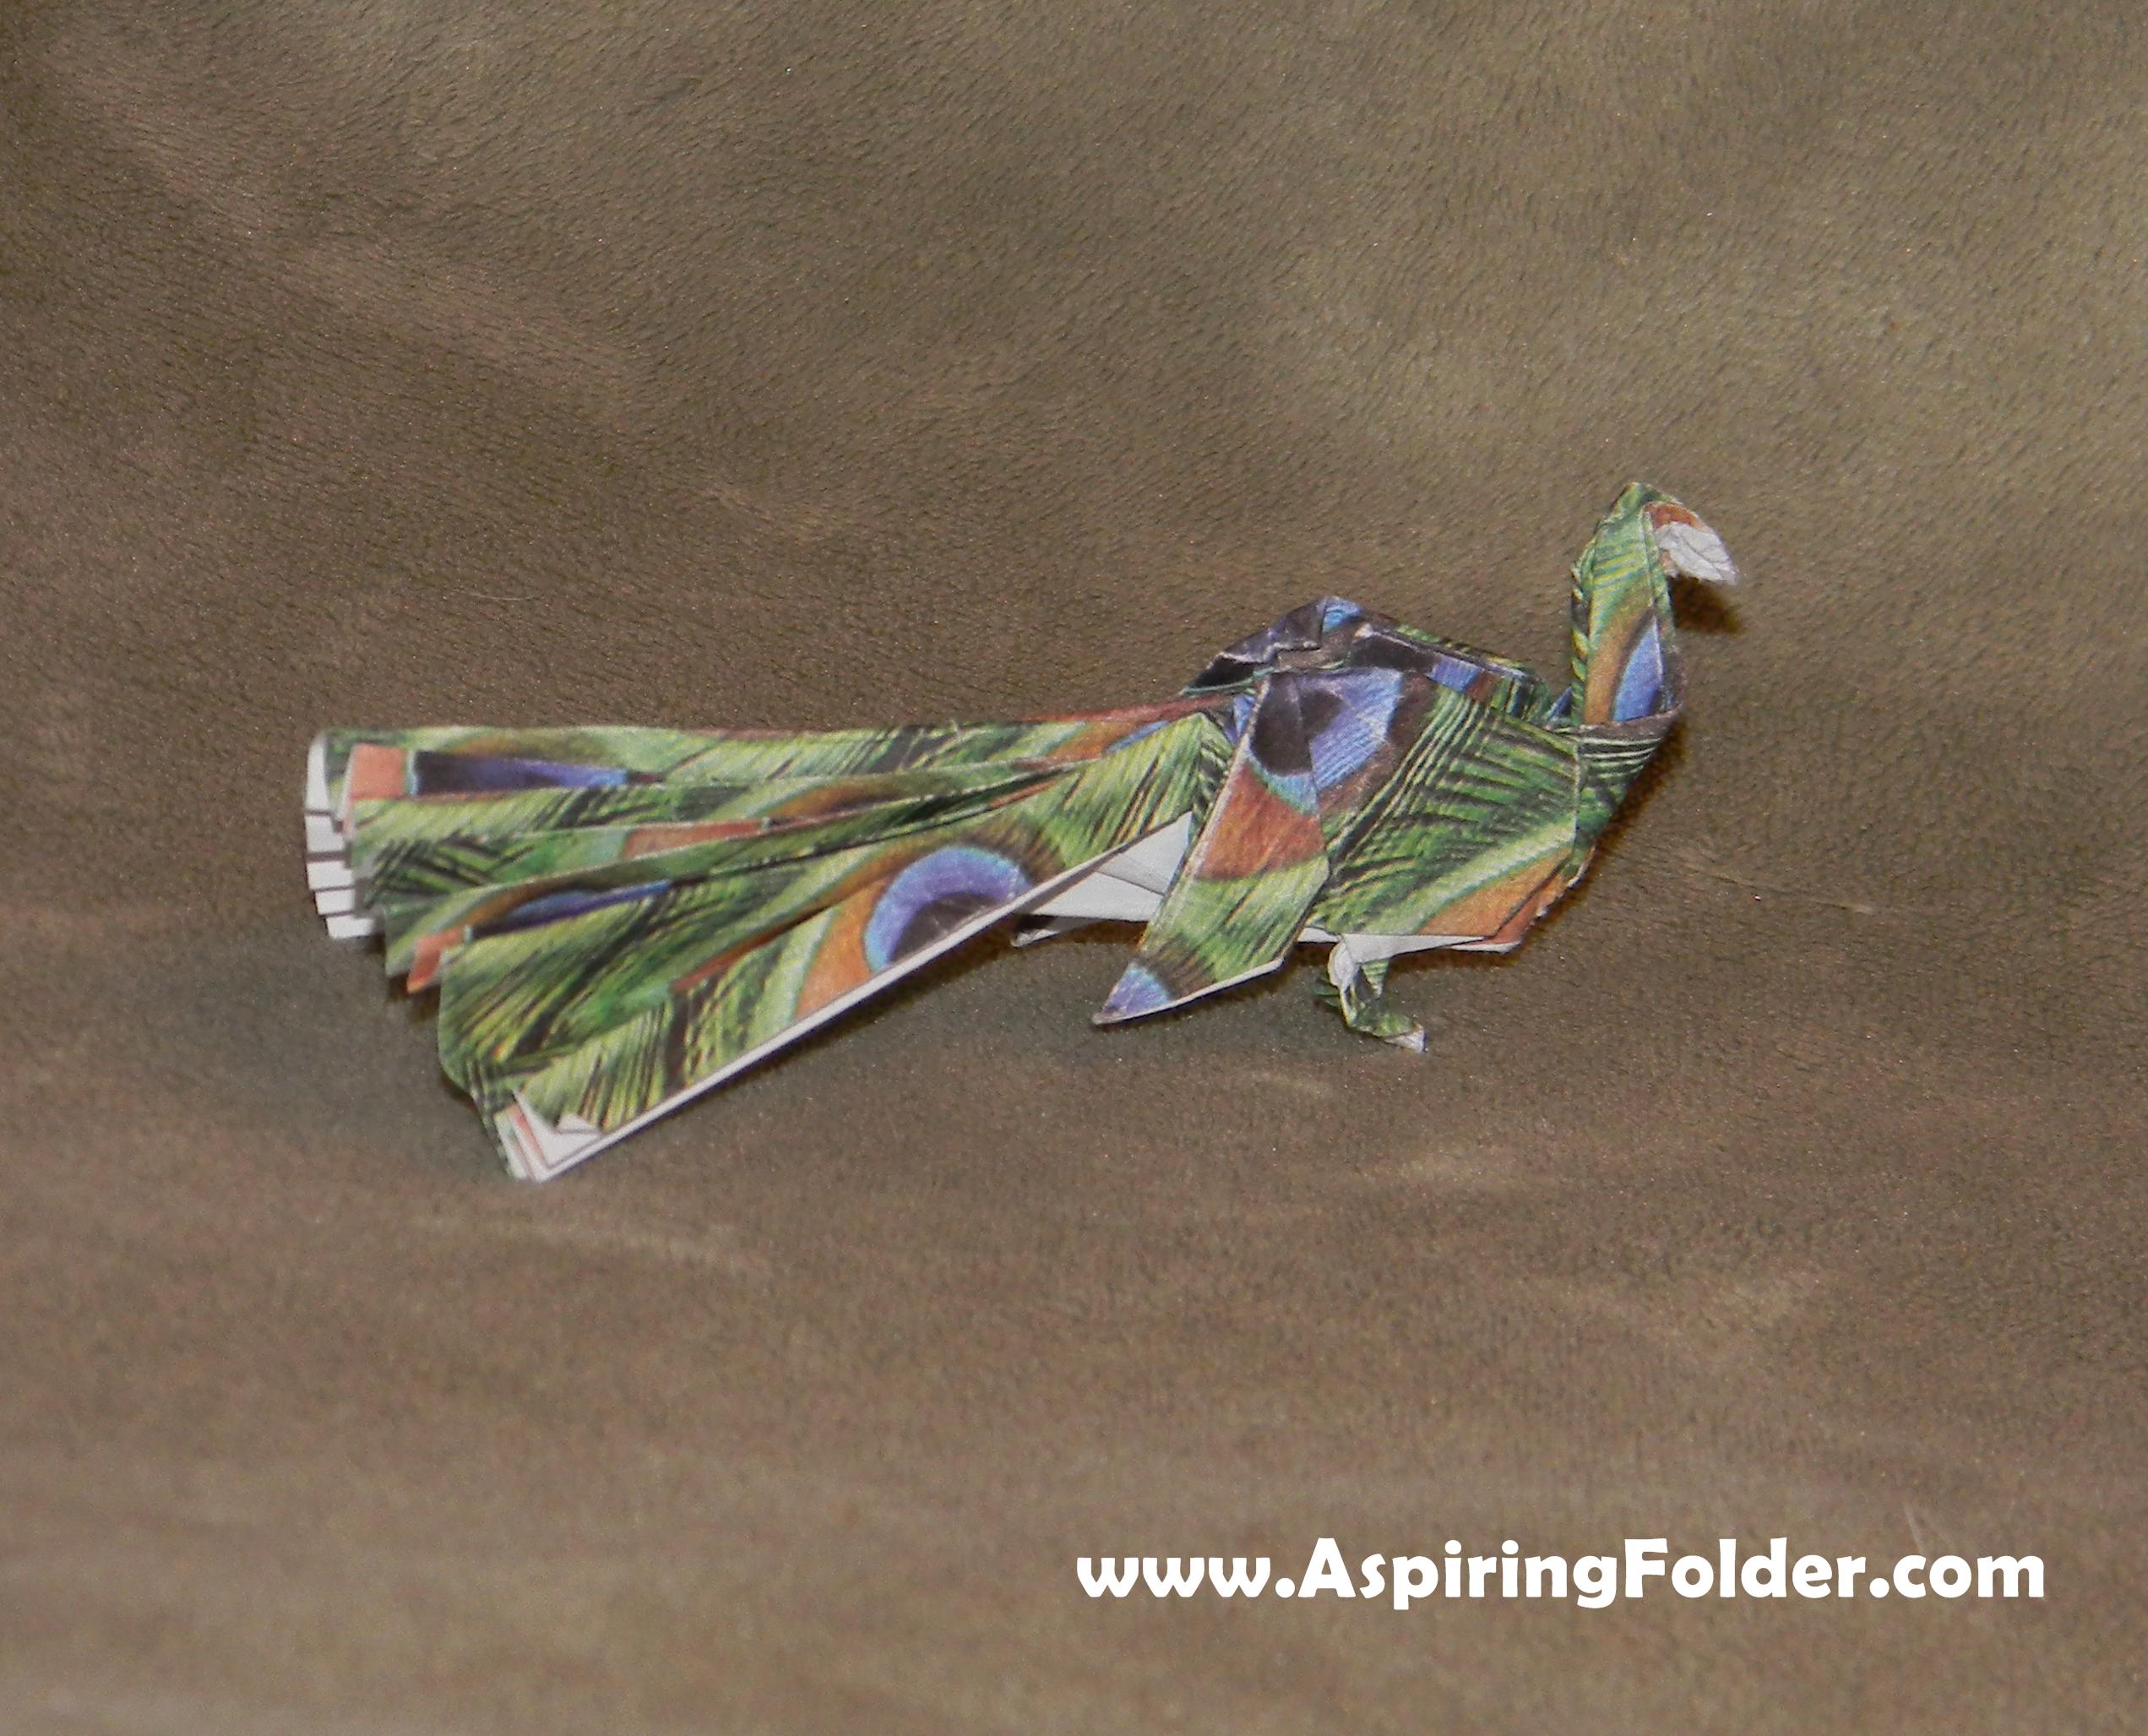 peacock bird diagram epiphone les paul coil tap wiring aspiring folder an origami blog page 3